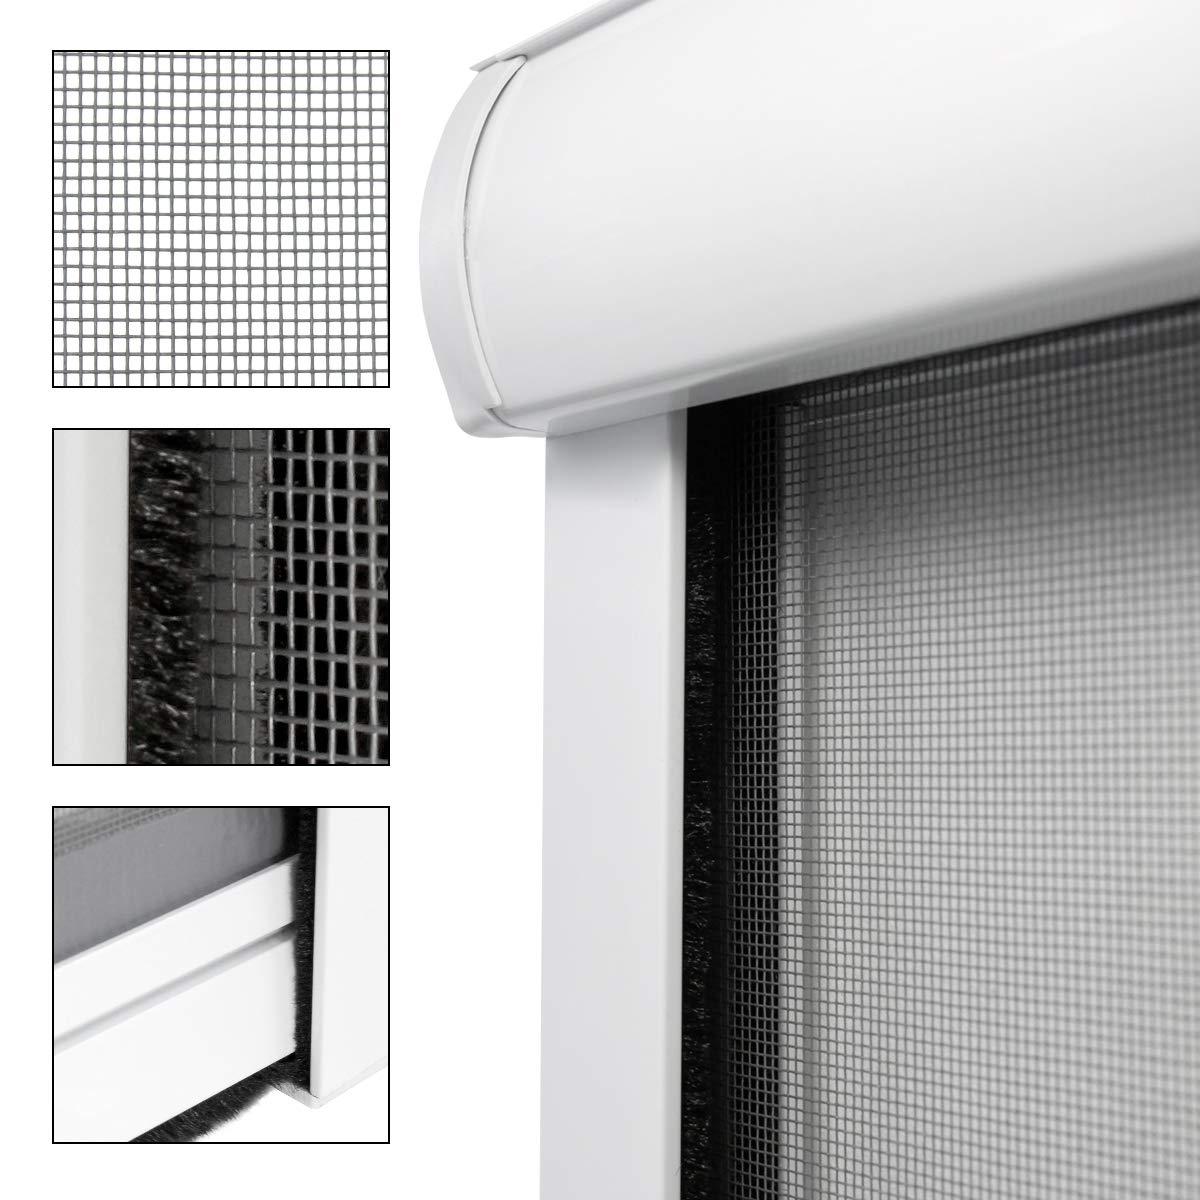 ECD Germany Mosquitera Enrollable para Ventana Color Marco Blanco Resistente a la Intemperie 160 x 160 cm Tela de Fibra de Vidrio Armazón de Aluminio Malla Protectora Hogar contra Insectos Mosquitos: Amazon.es: